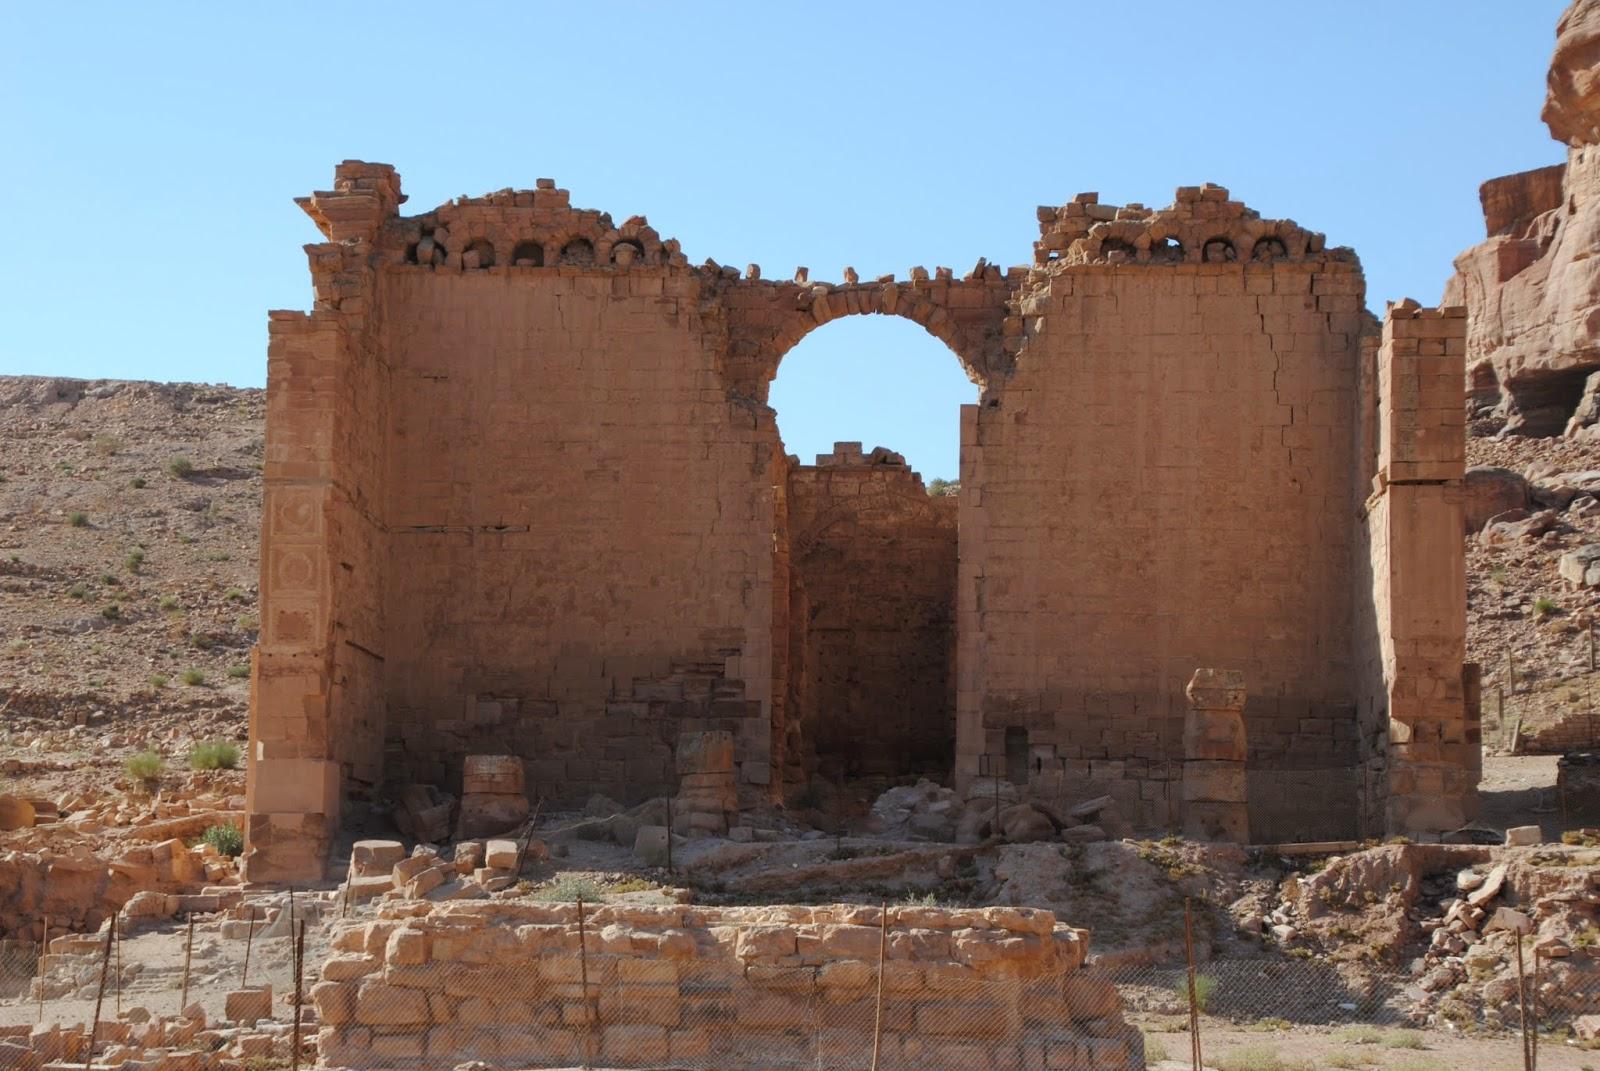 My Photos: Jordan -- Petra -- Qasr al Bint